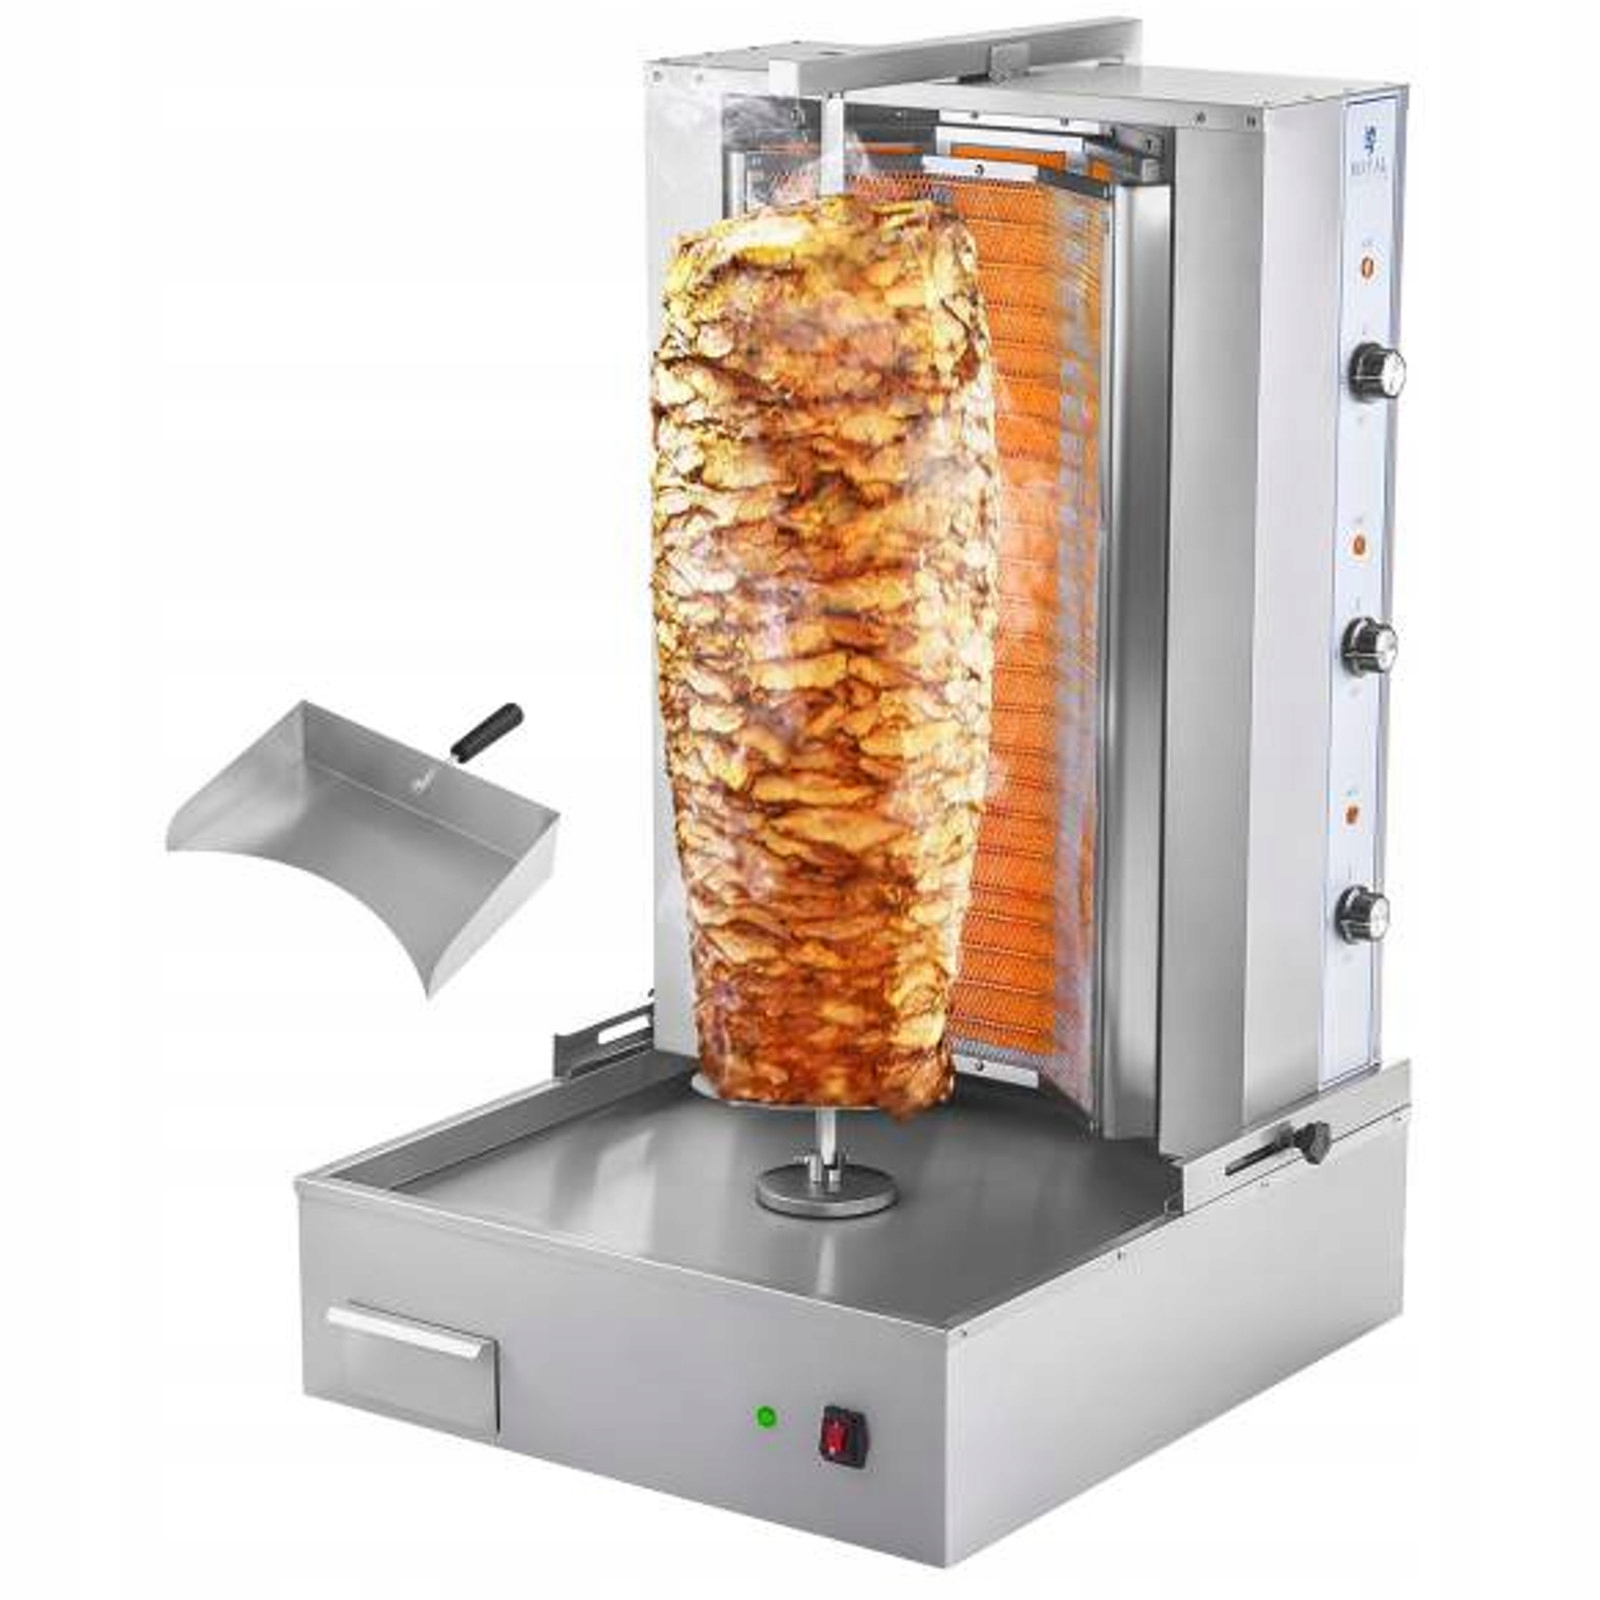 Opiekacz piec do kebaba gyrosa elektryczny 400V 6k